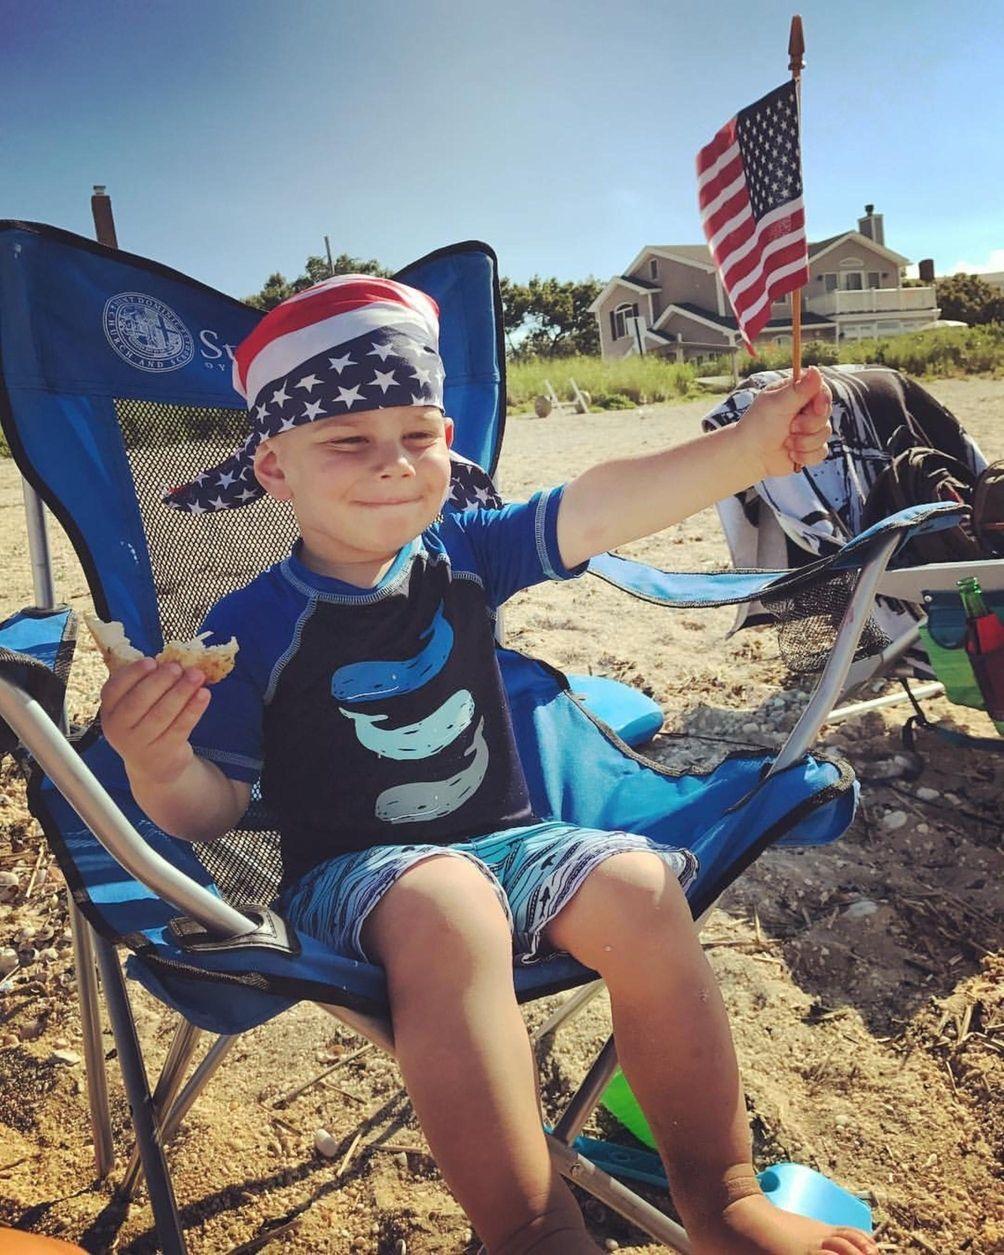 Our grandson, Carl JP Bishop enjoying the 4th